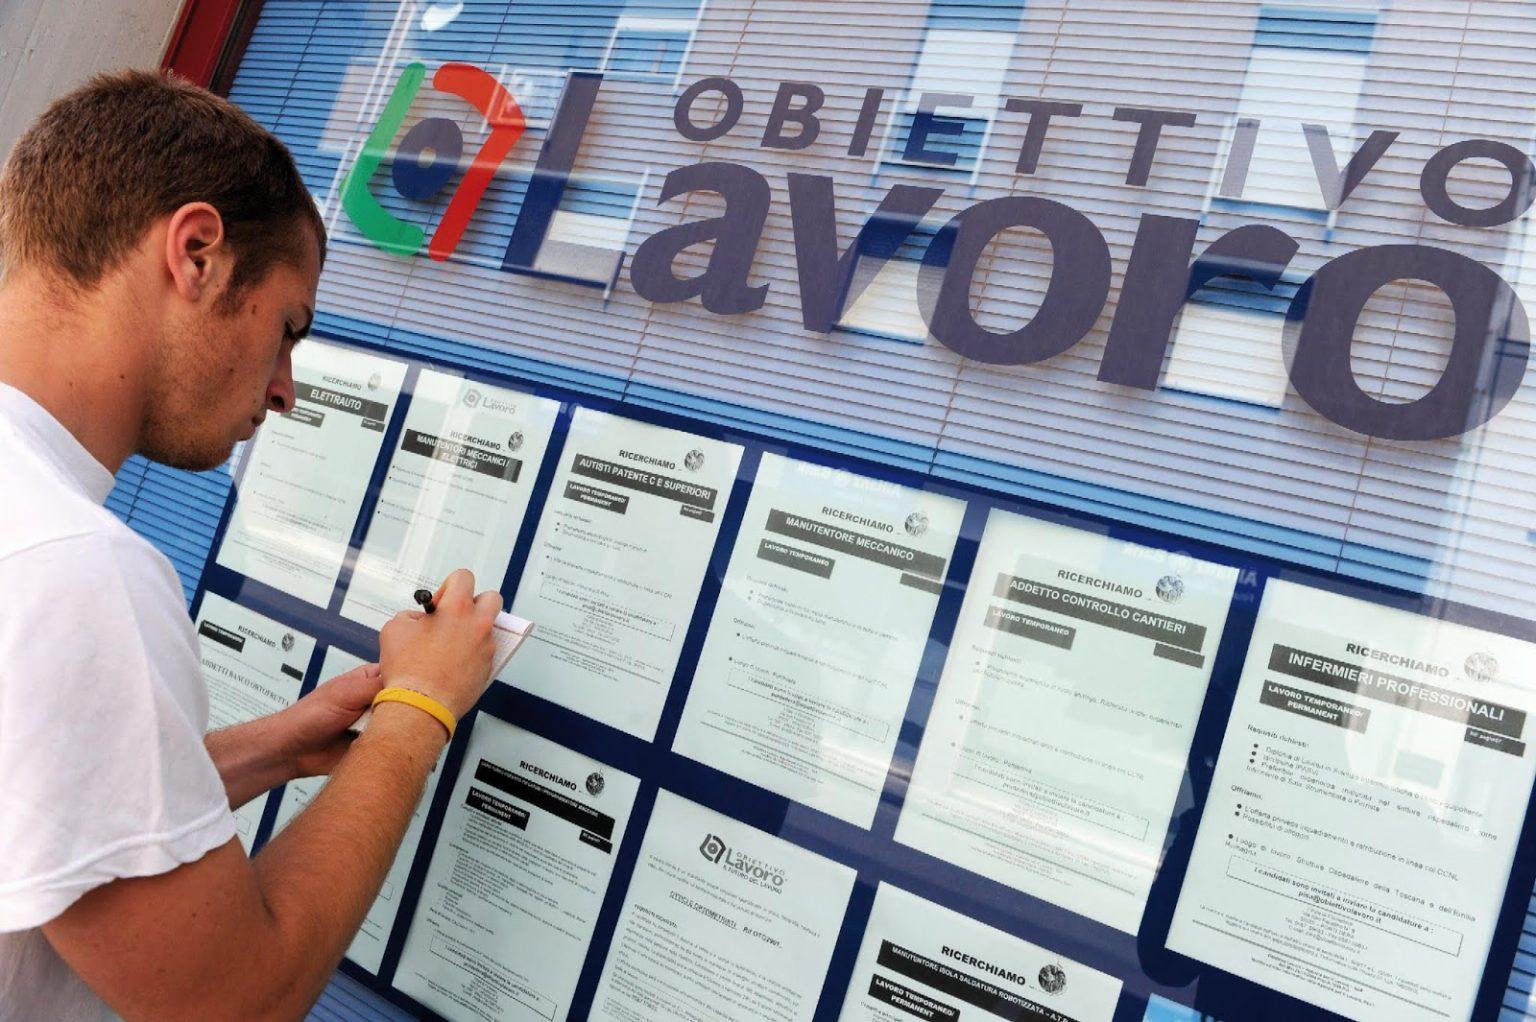 Unemployment in the European Union